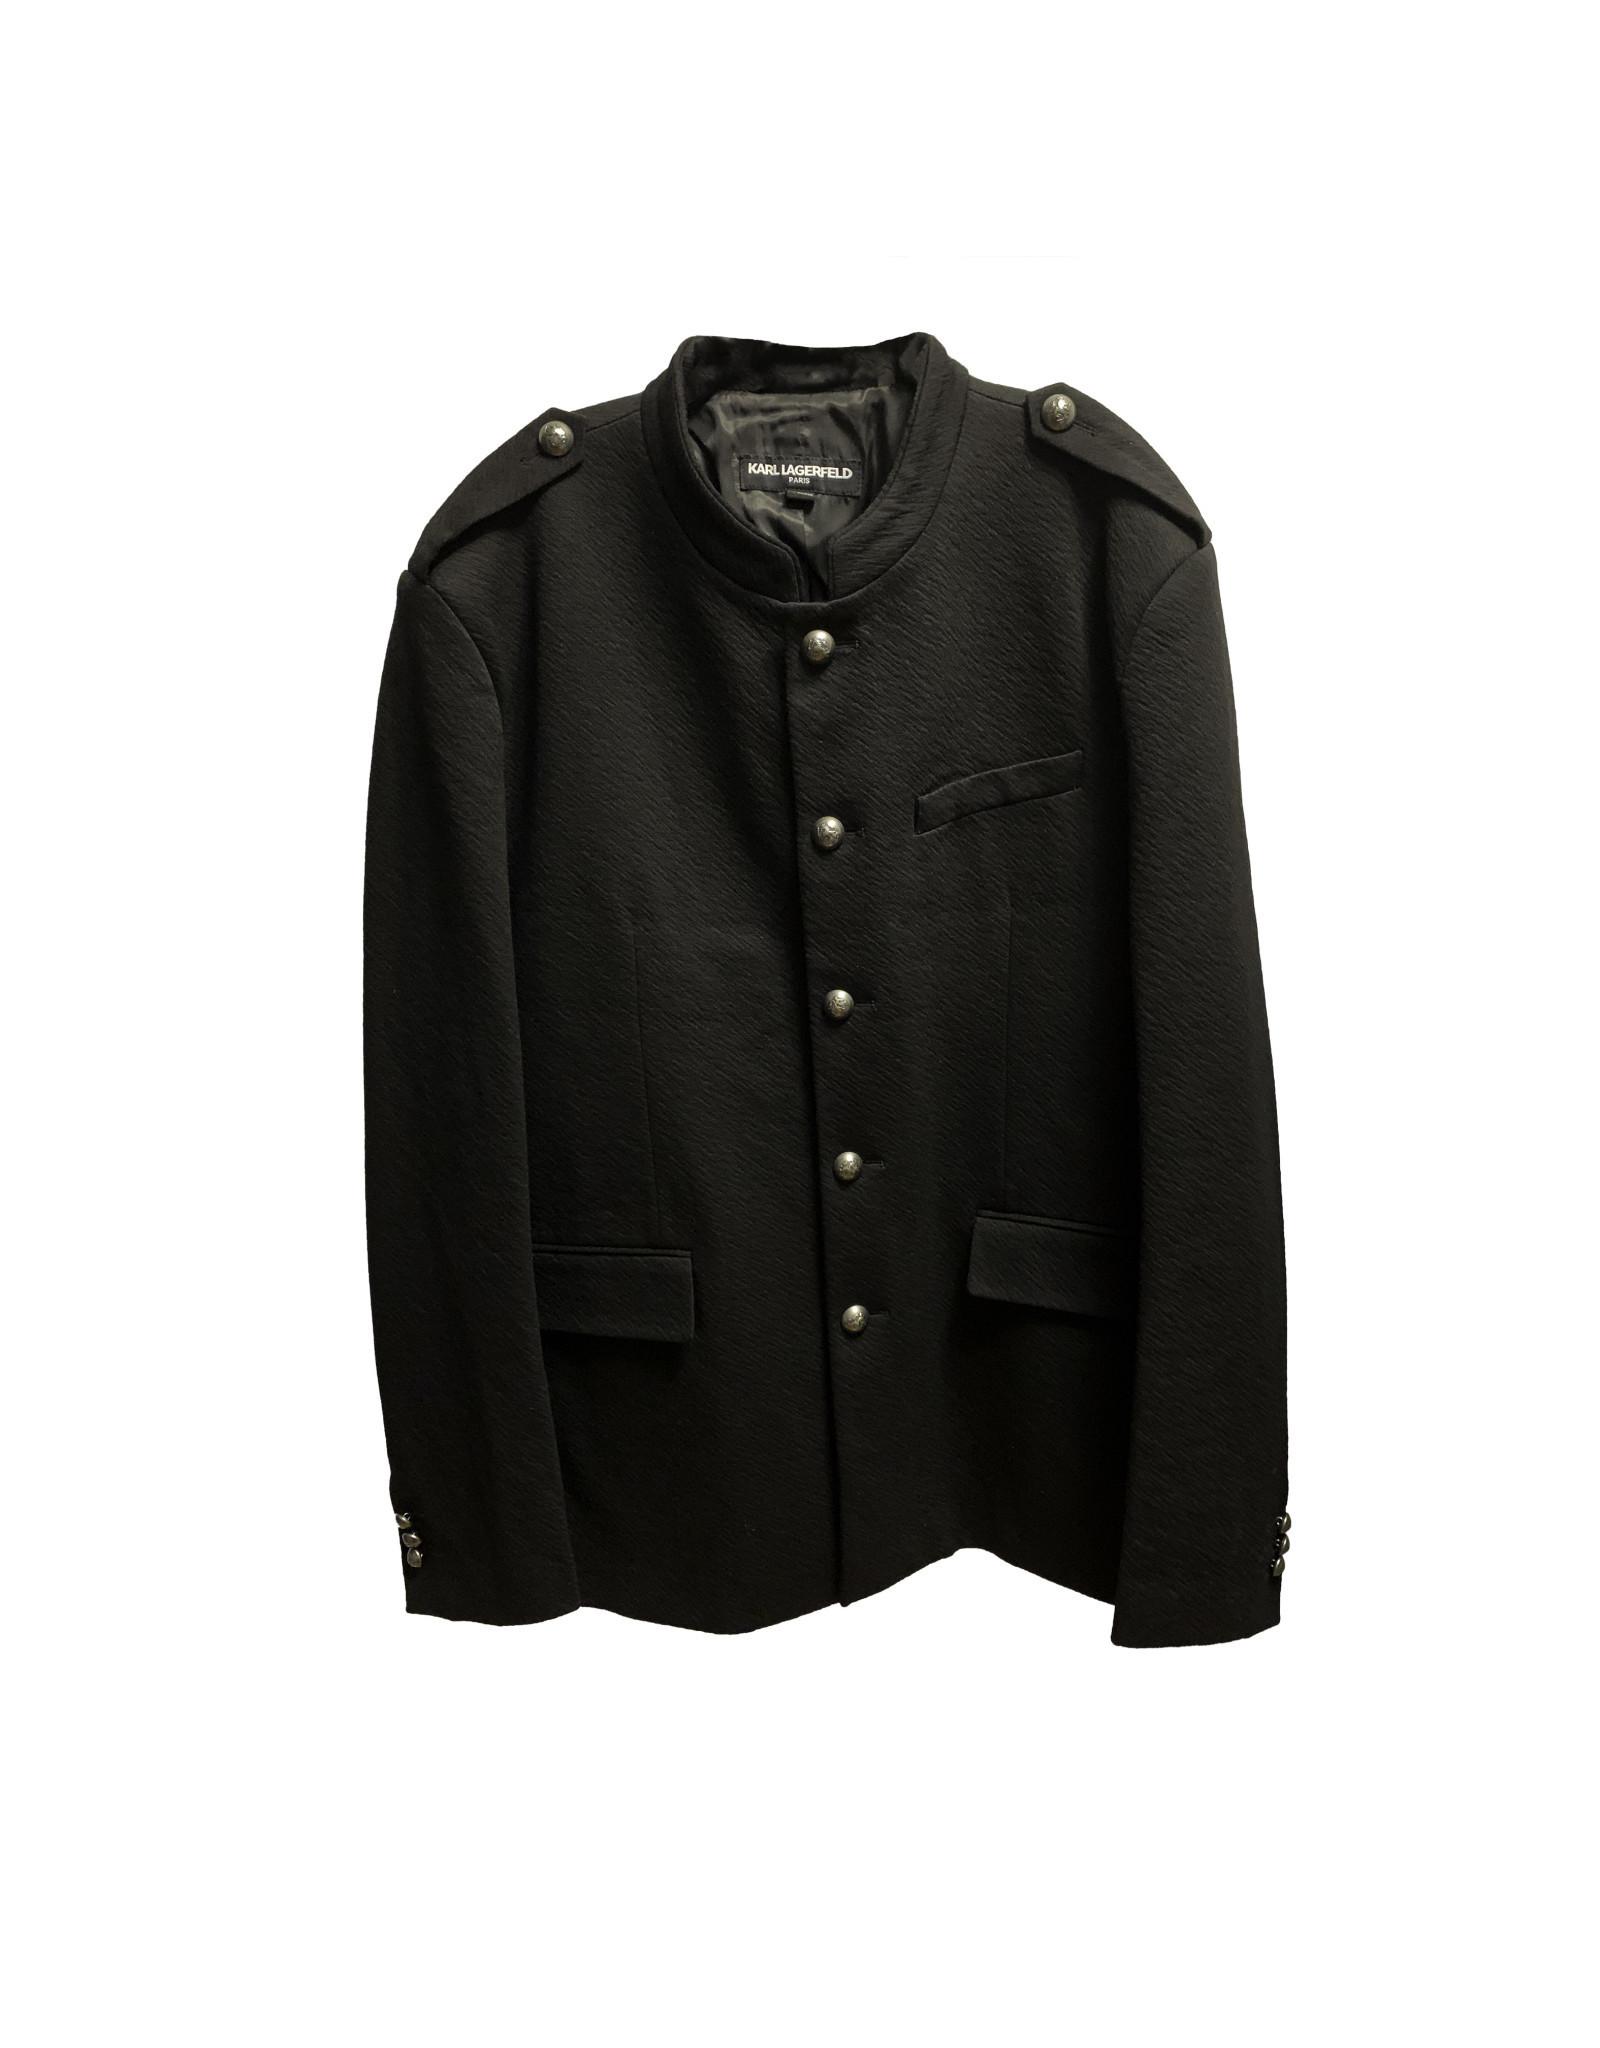 KARL LAGERFELD Karllagerfeld  Men's  Black Jacket  Size XL